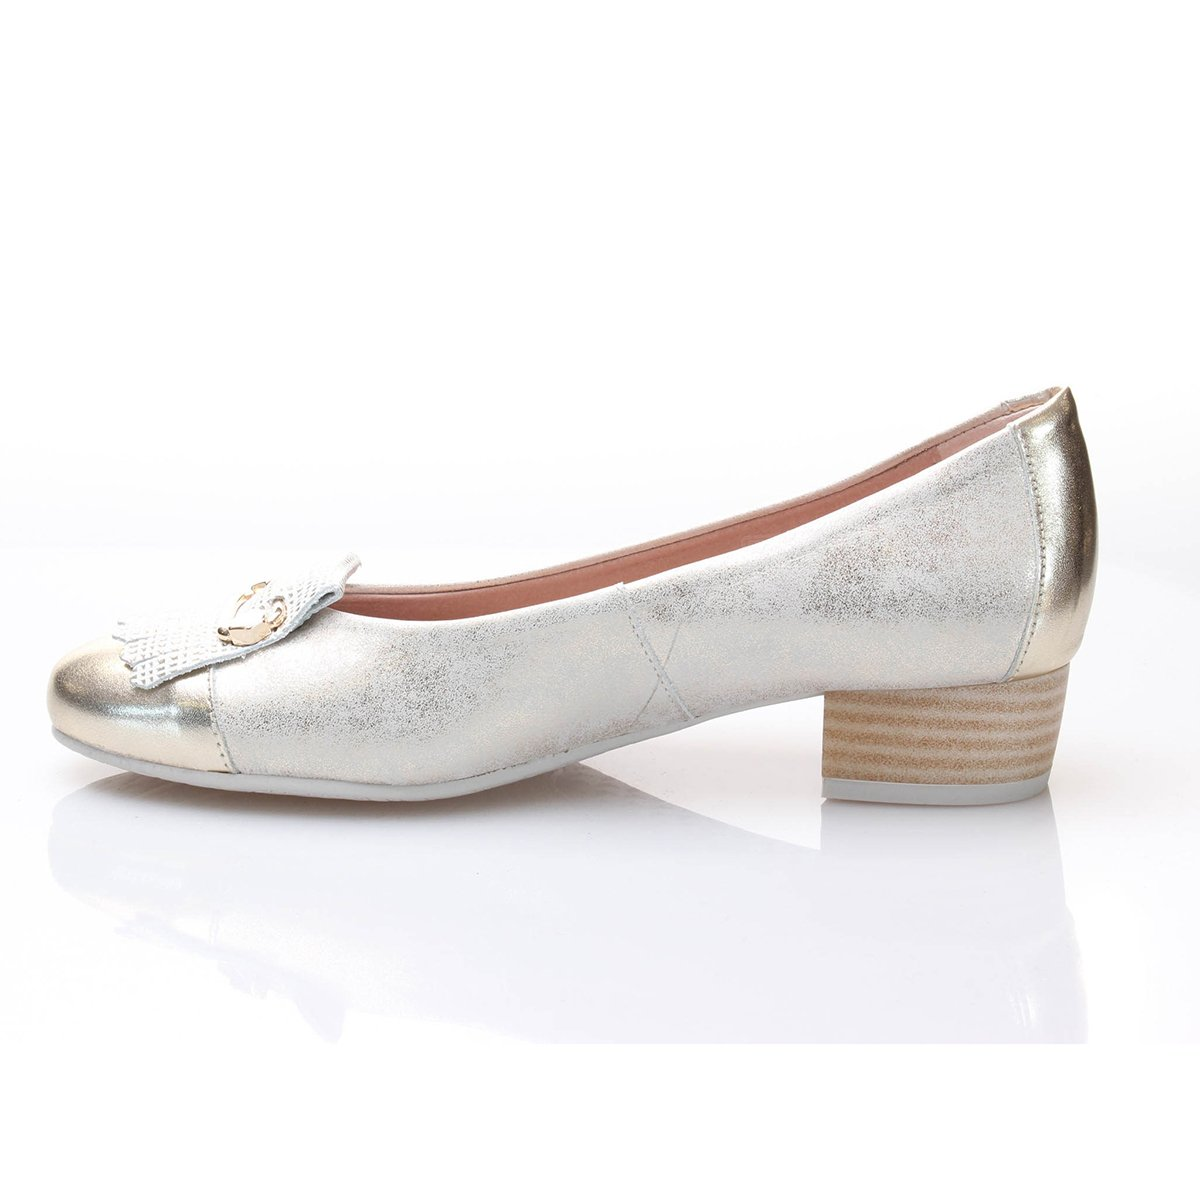 Pitillos Zapato Fleco Puntera Mujer Oro 35 pBmkG